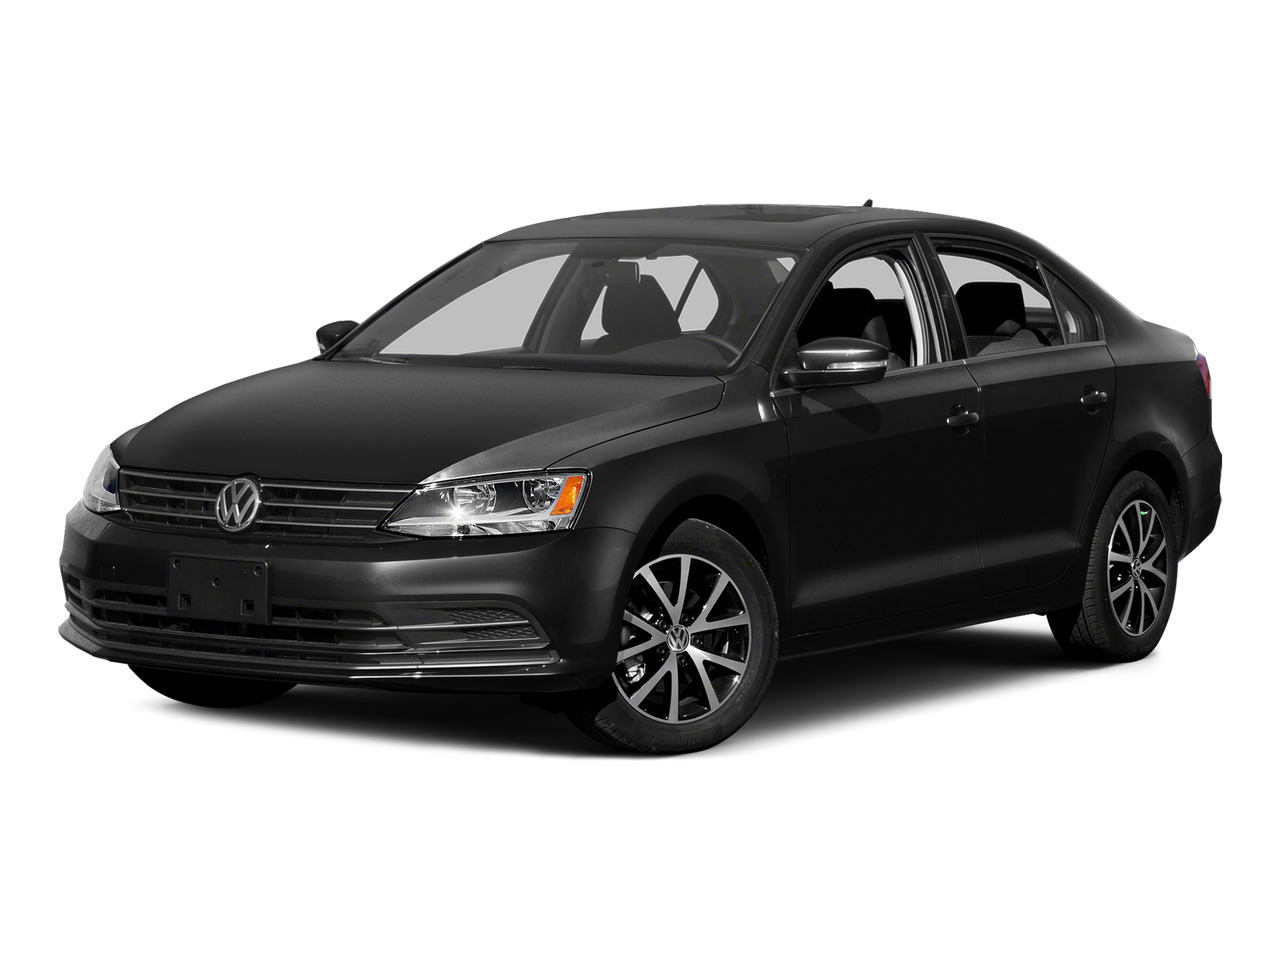 2015 Volkswagen Jetta 2.0L TDI SE 4dr Car Slide